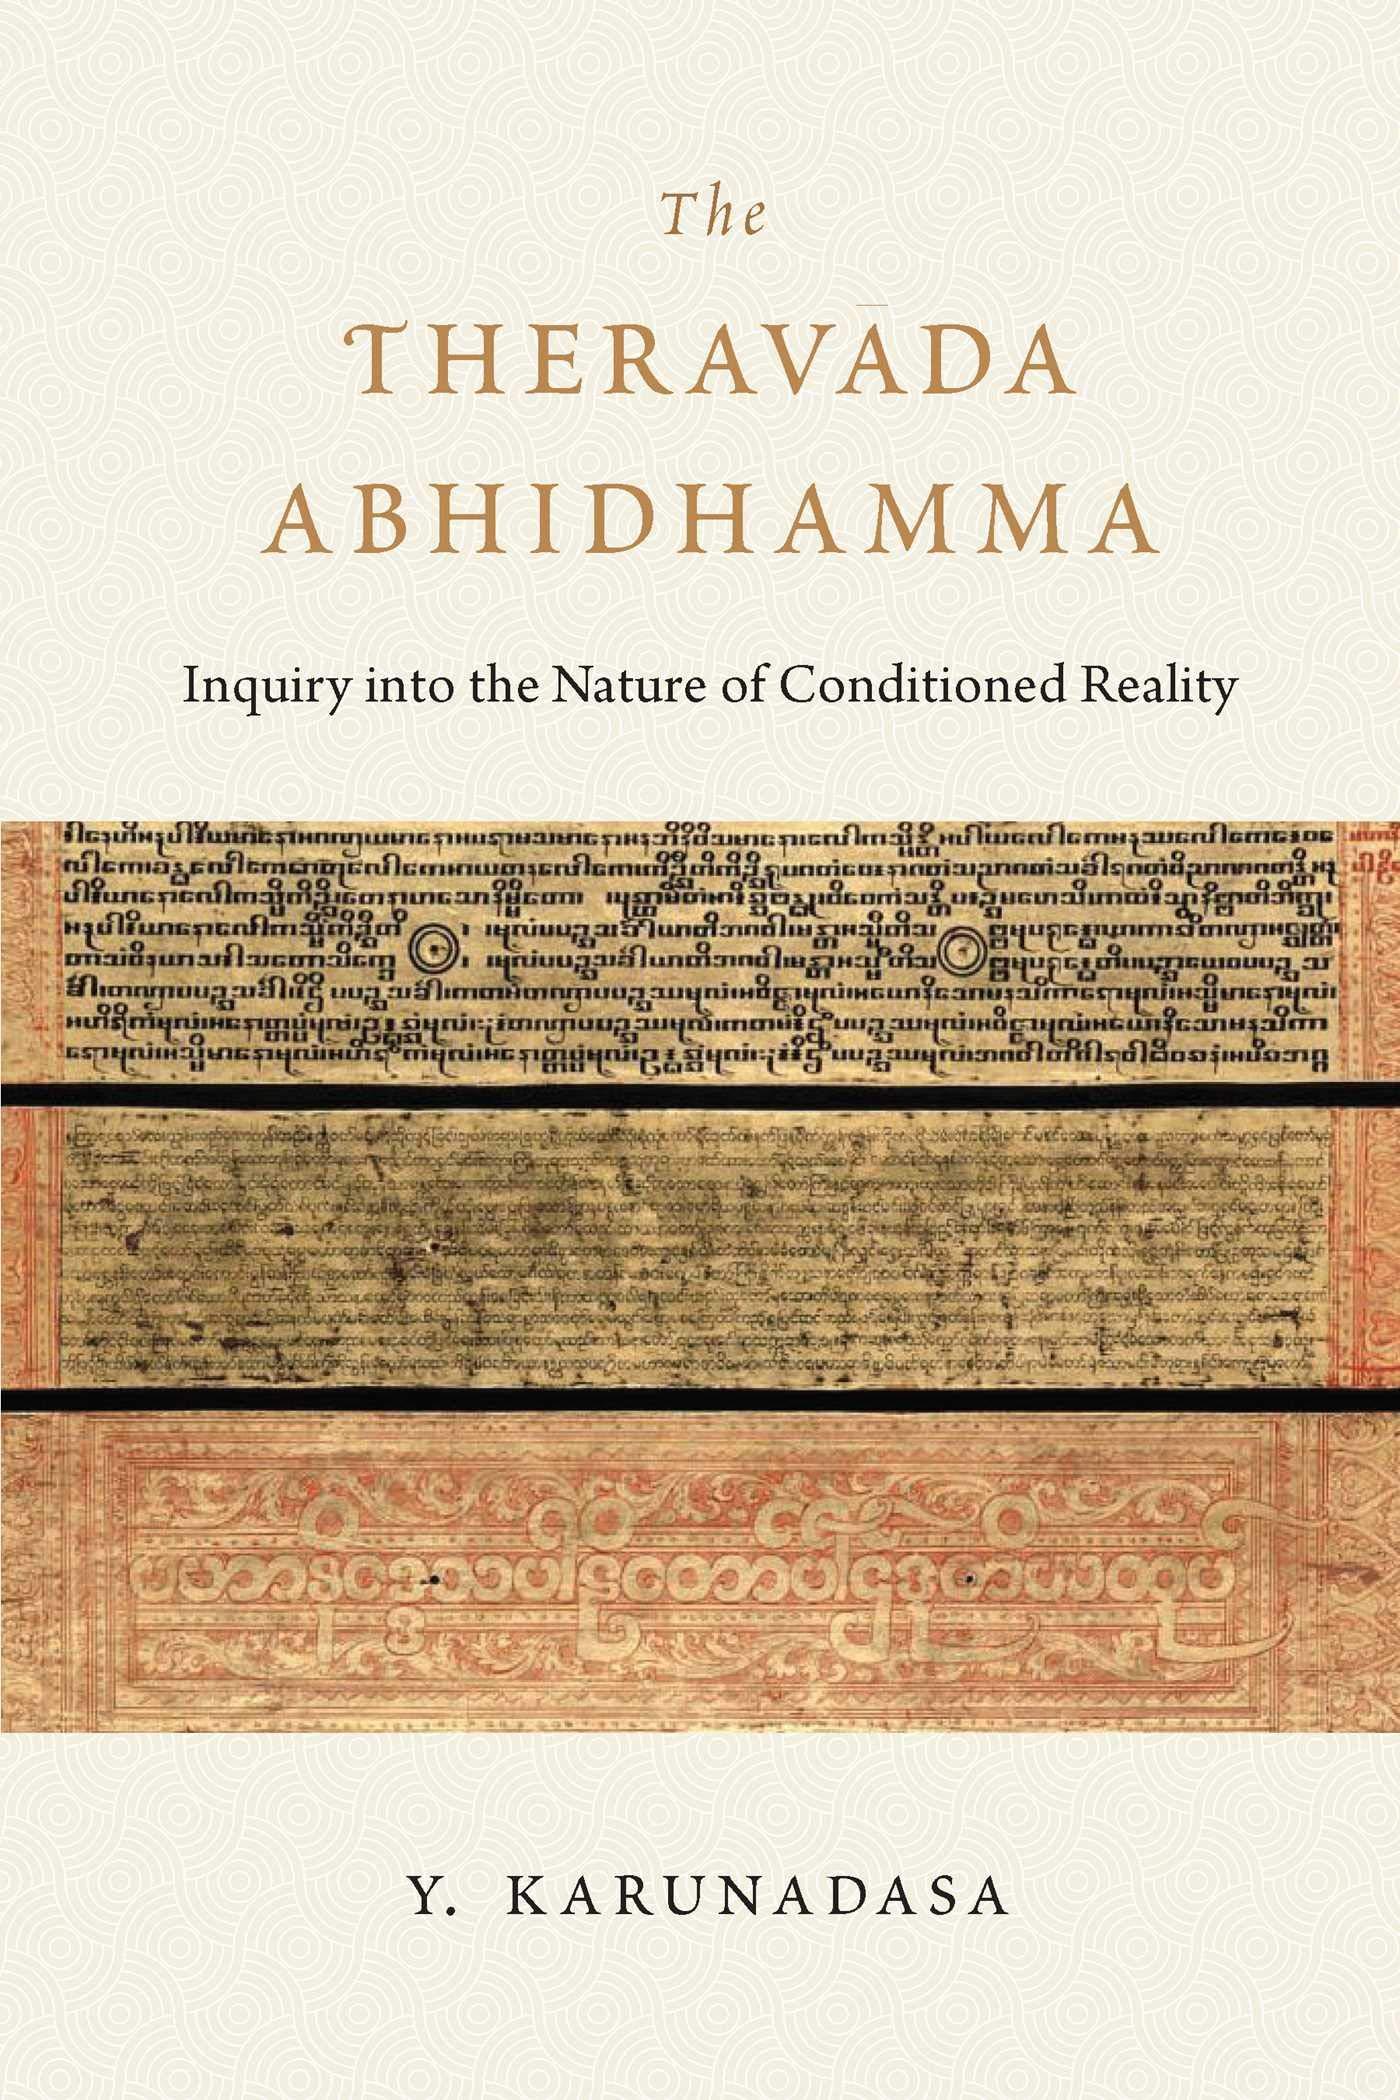 Karunadasa Abhidhamma cover art